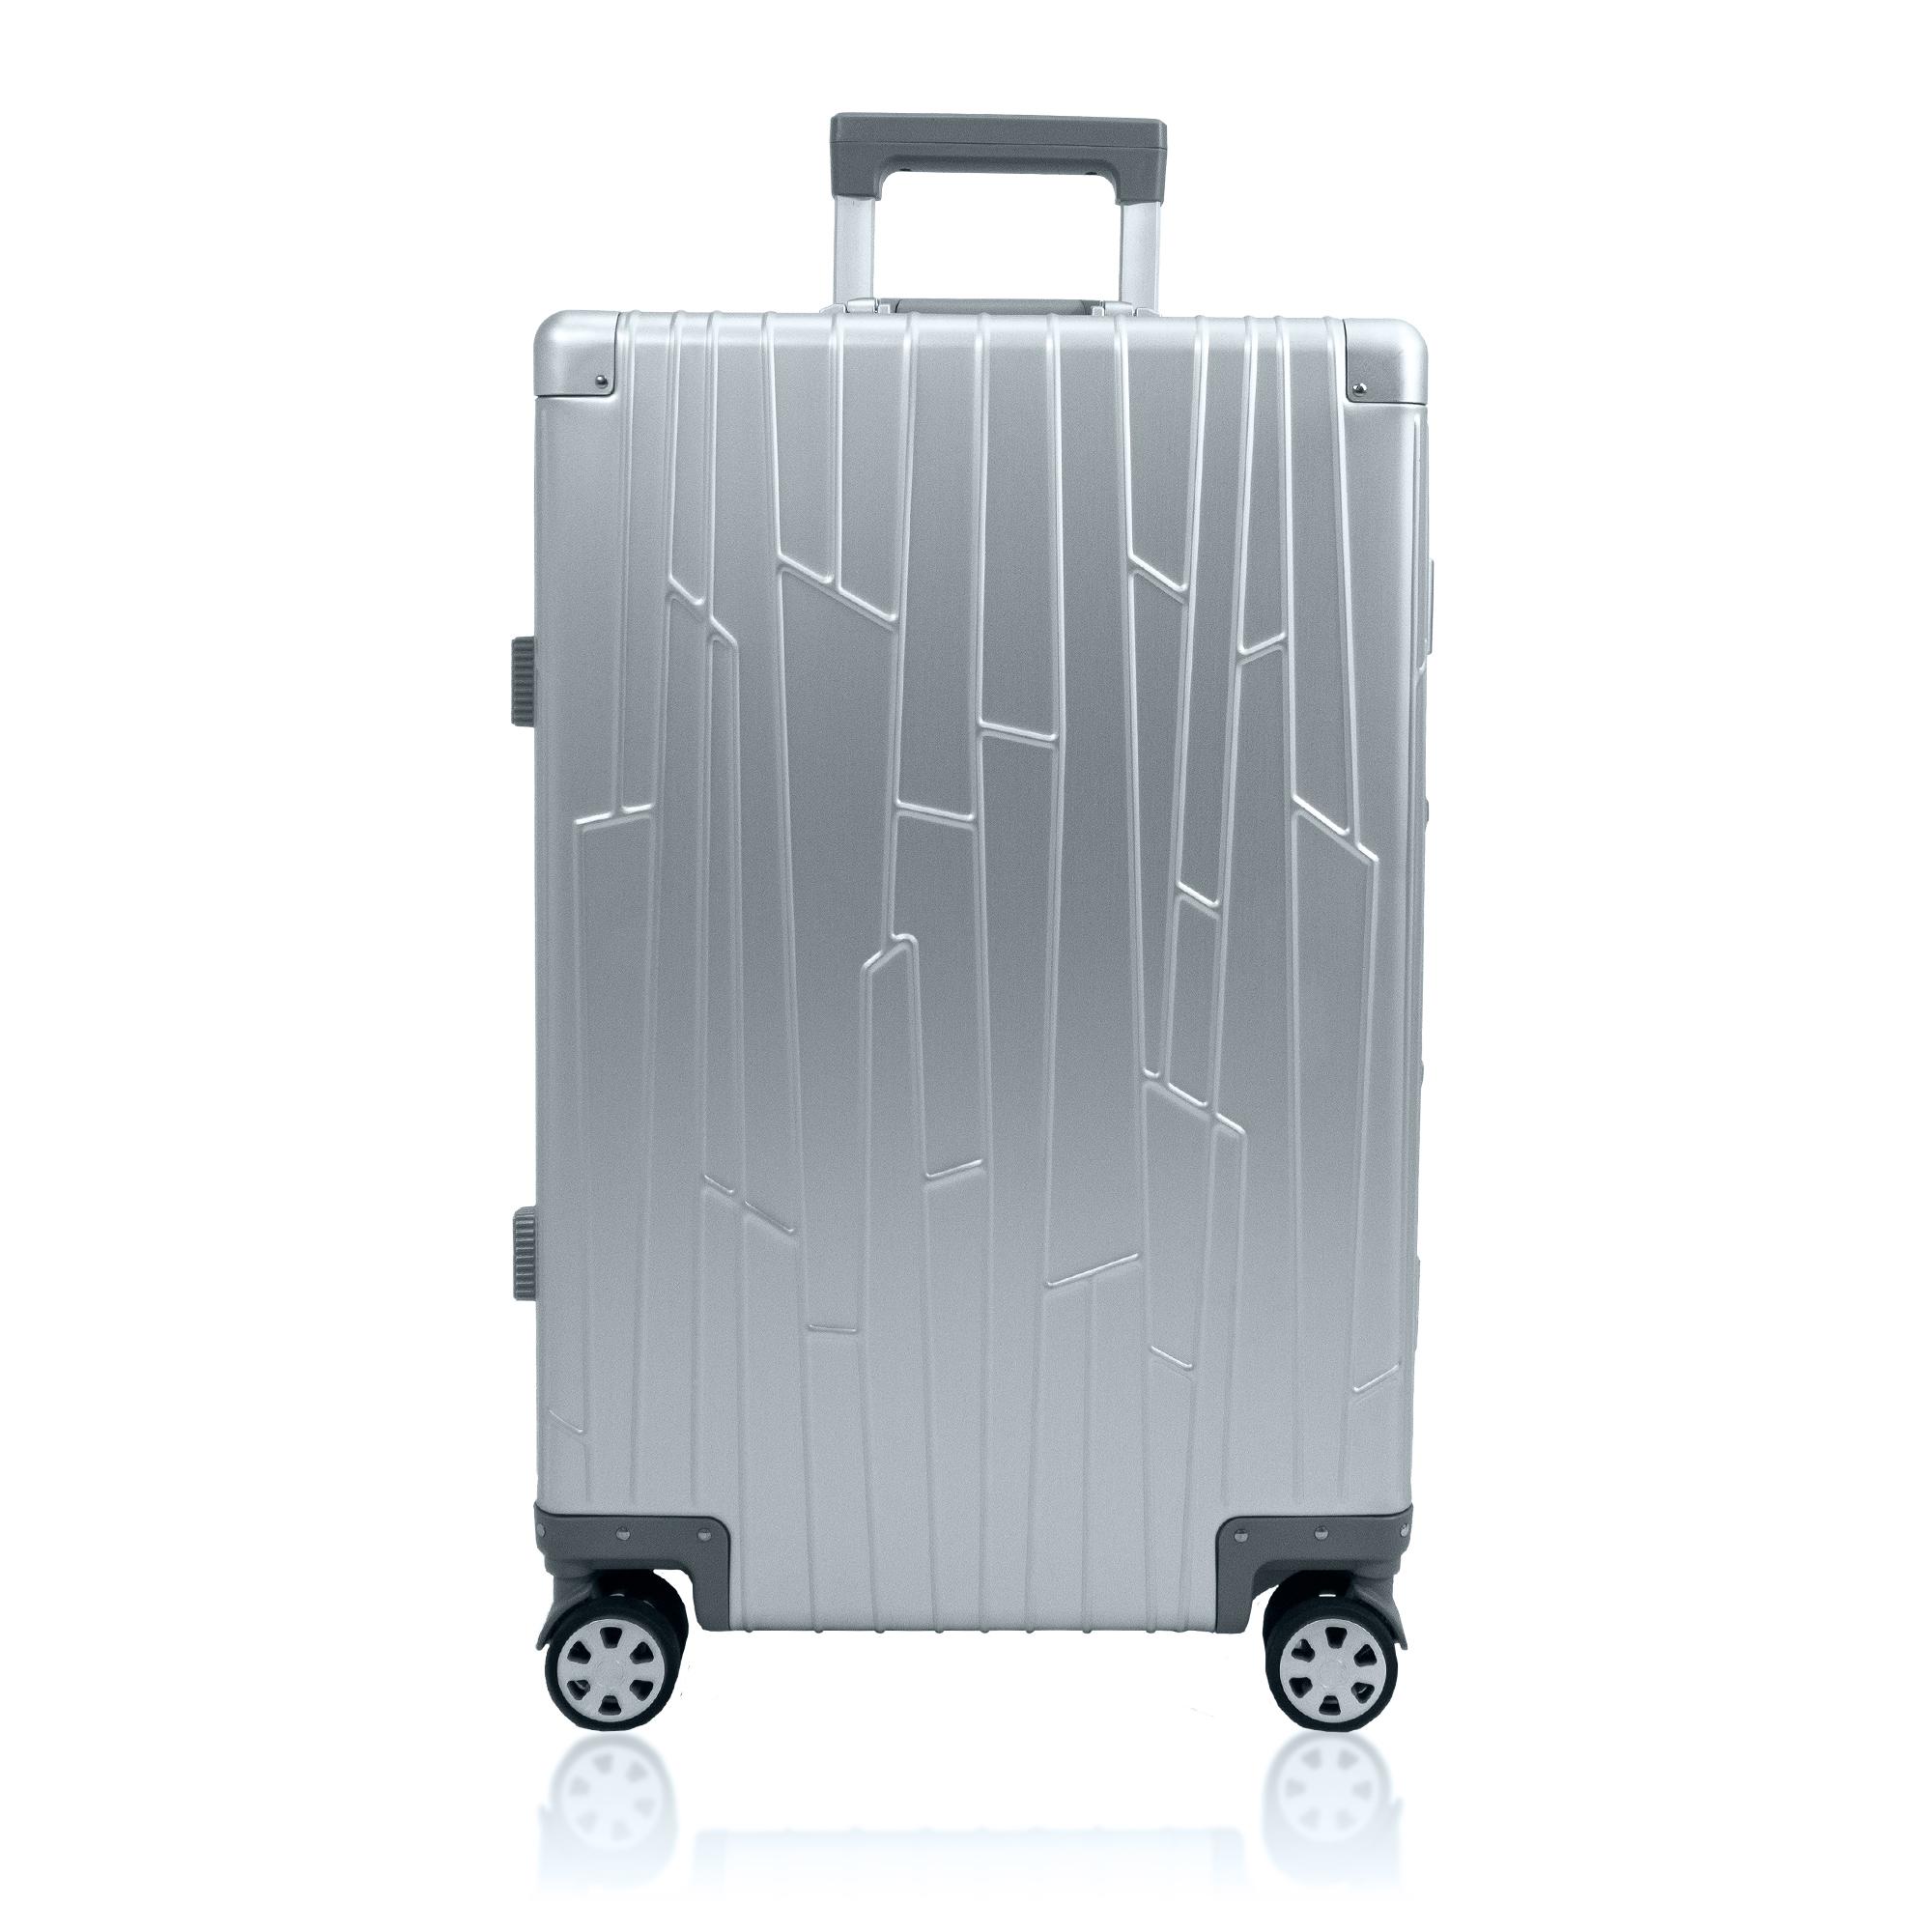 silver aluminium suitcase gundel check in sized luggage tsa-locks